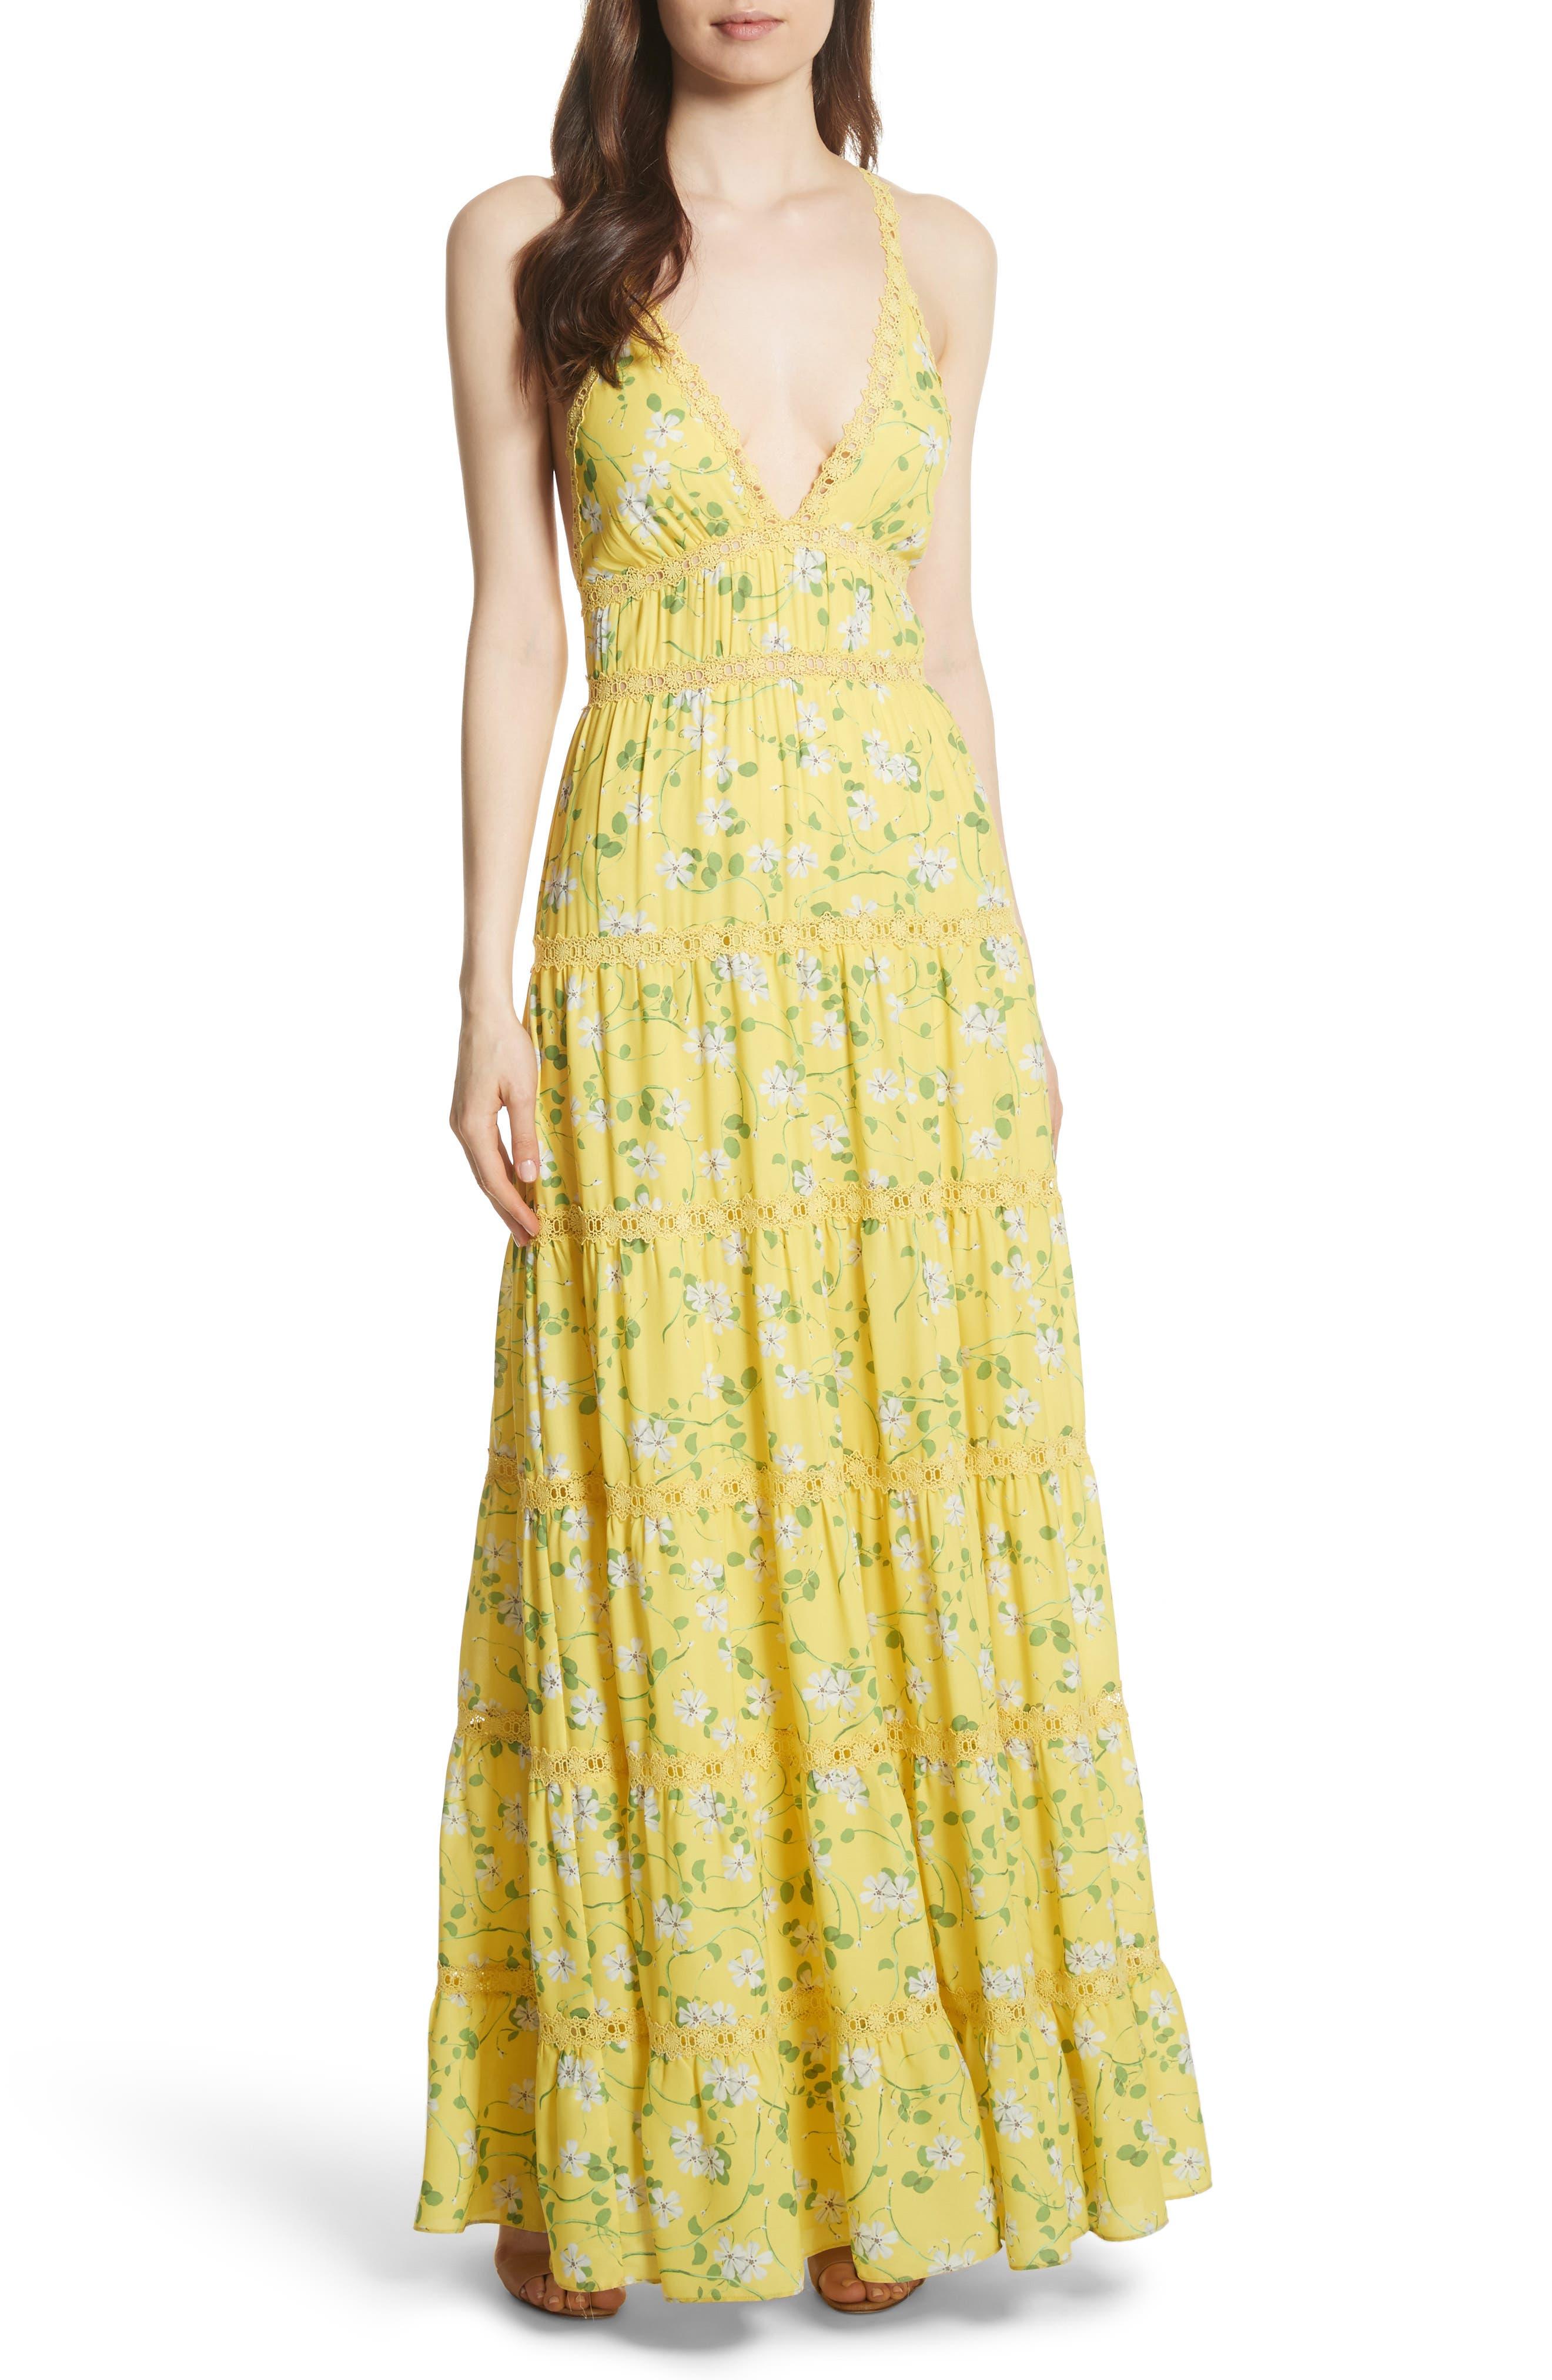 Alternate Image 1 Selected - Alice + Olivia Karolina Print Maxi Dress